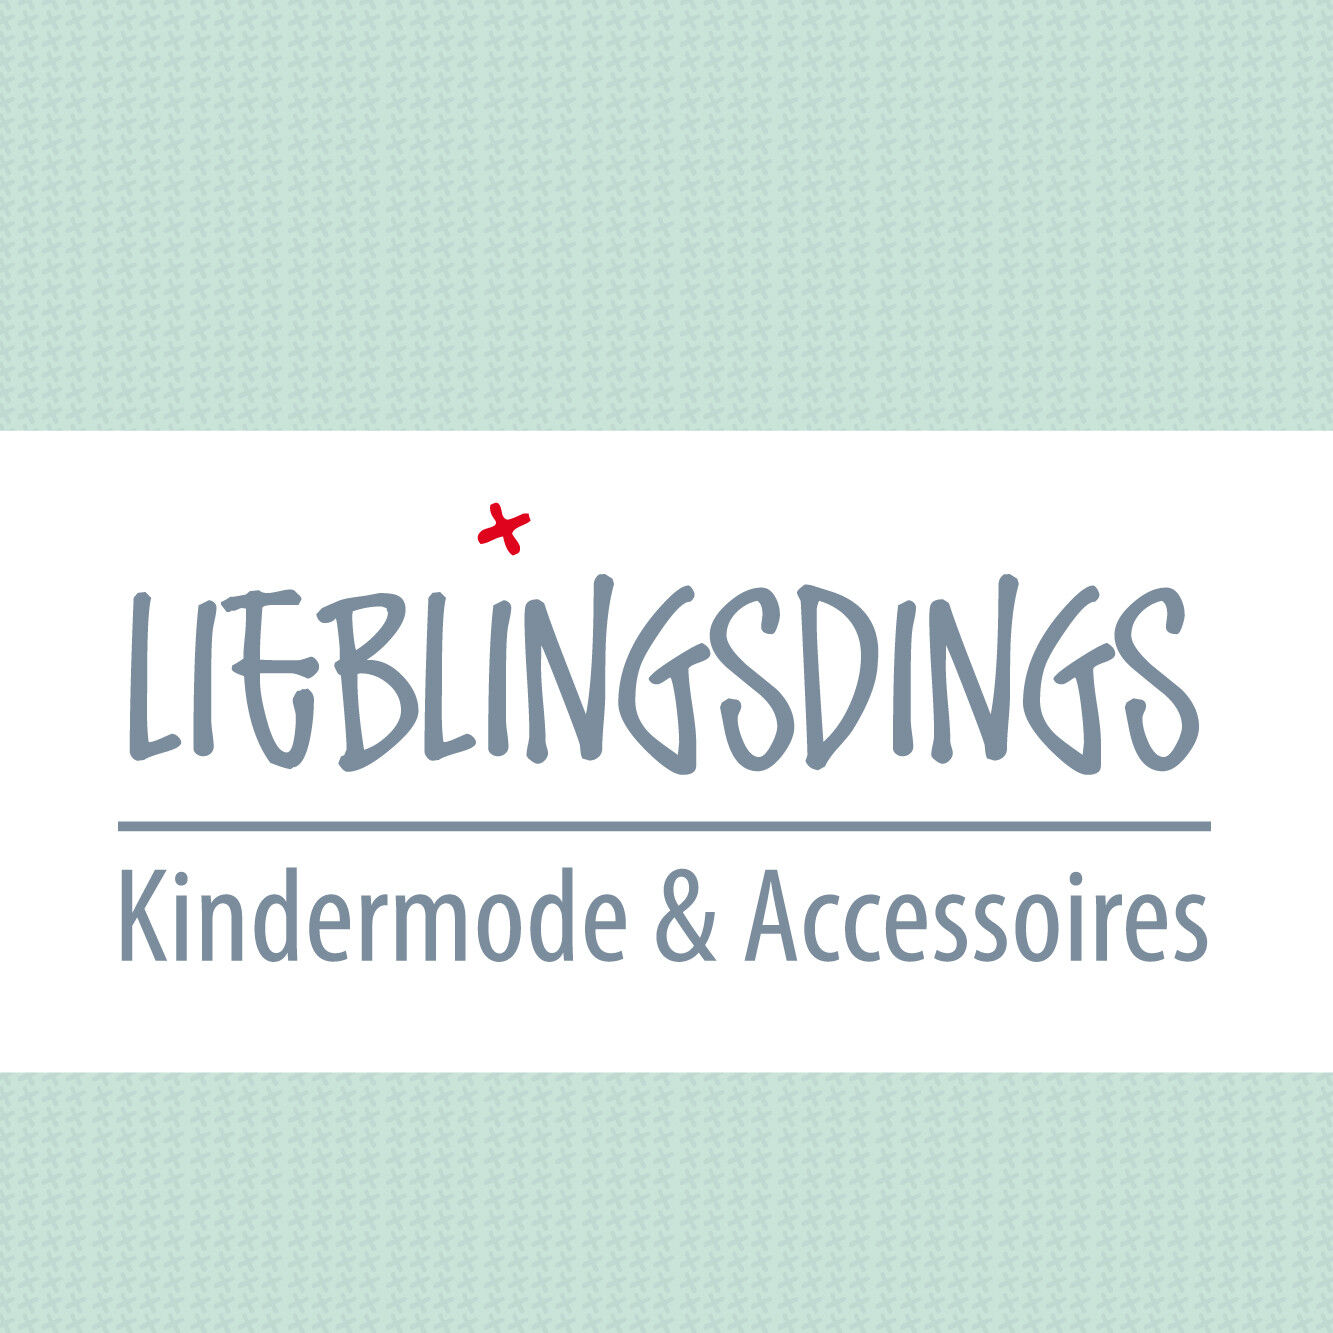 LIEBLINGSDINGS Kindermode&Acc